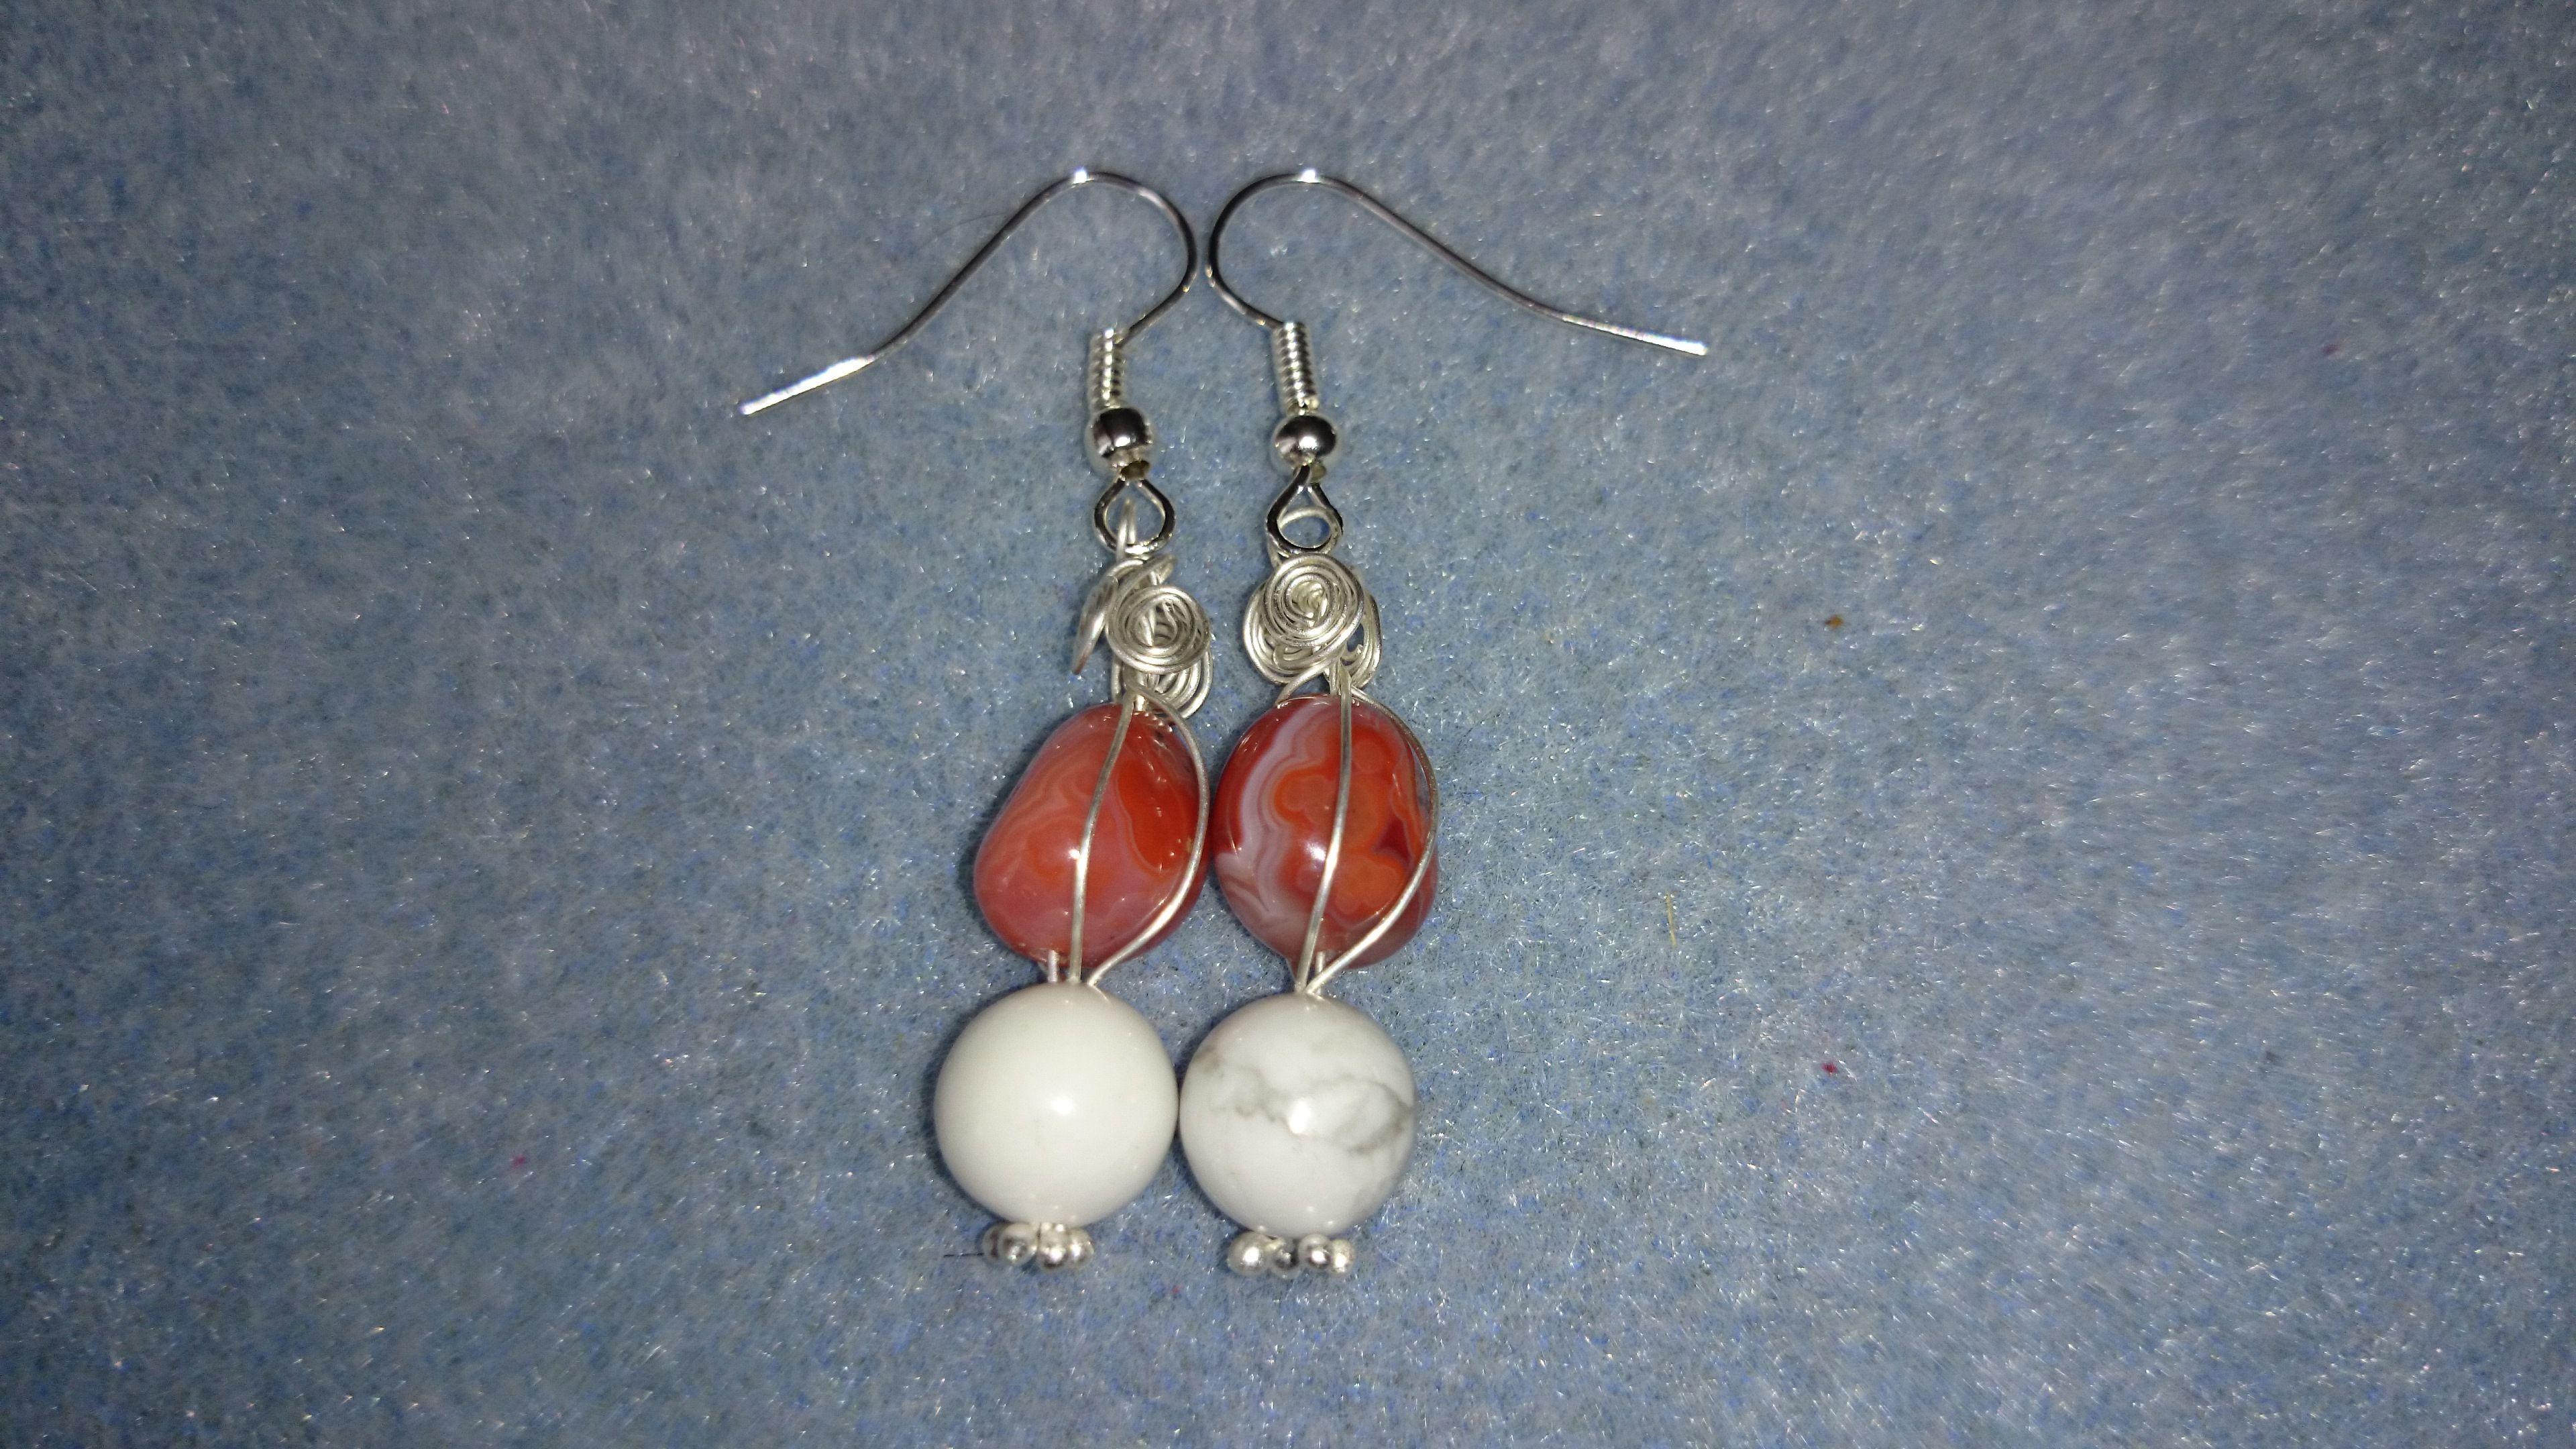 Burnt orange agate and white magnesite wire wrapped earrings www.facebook.com/KimsGlitteringGems